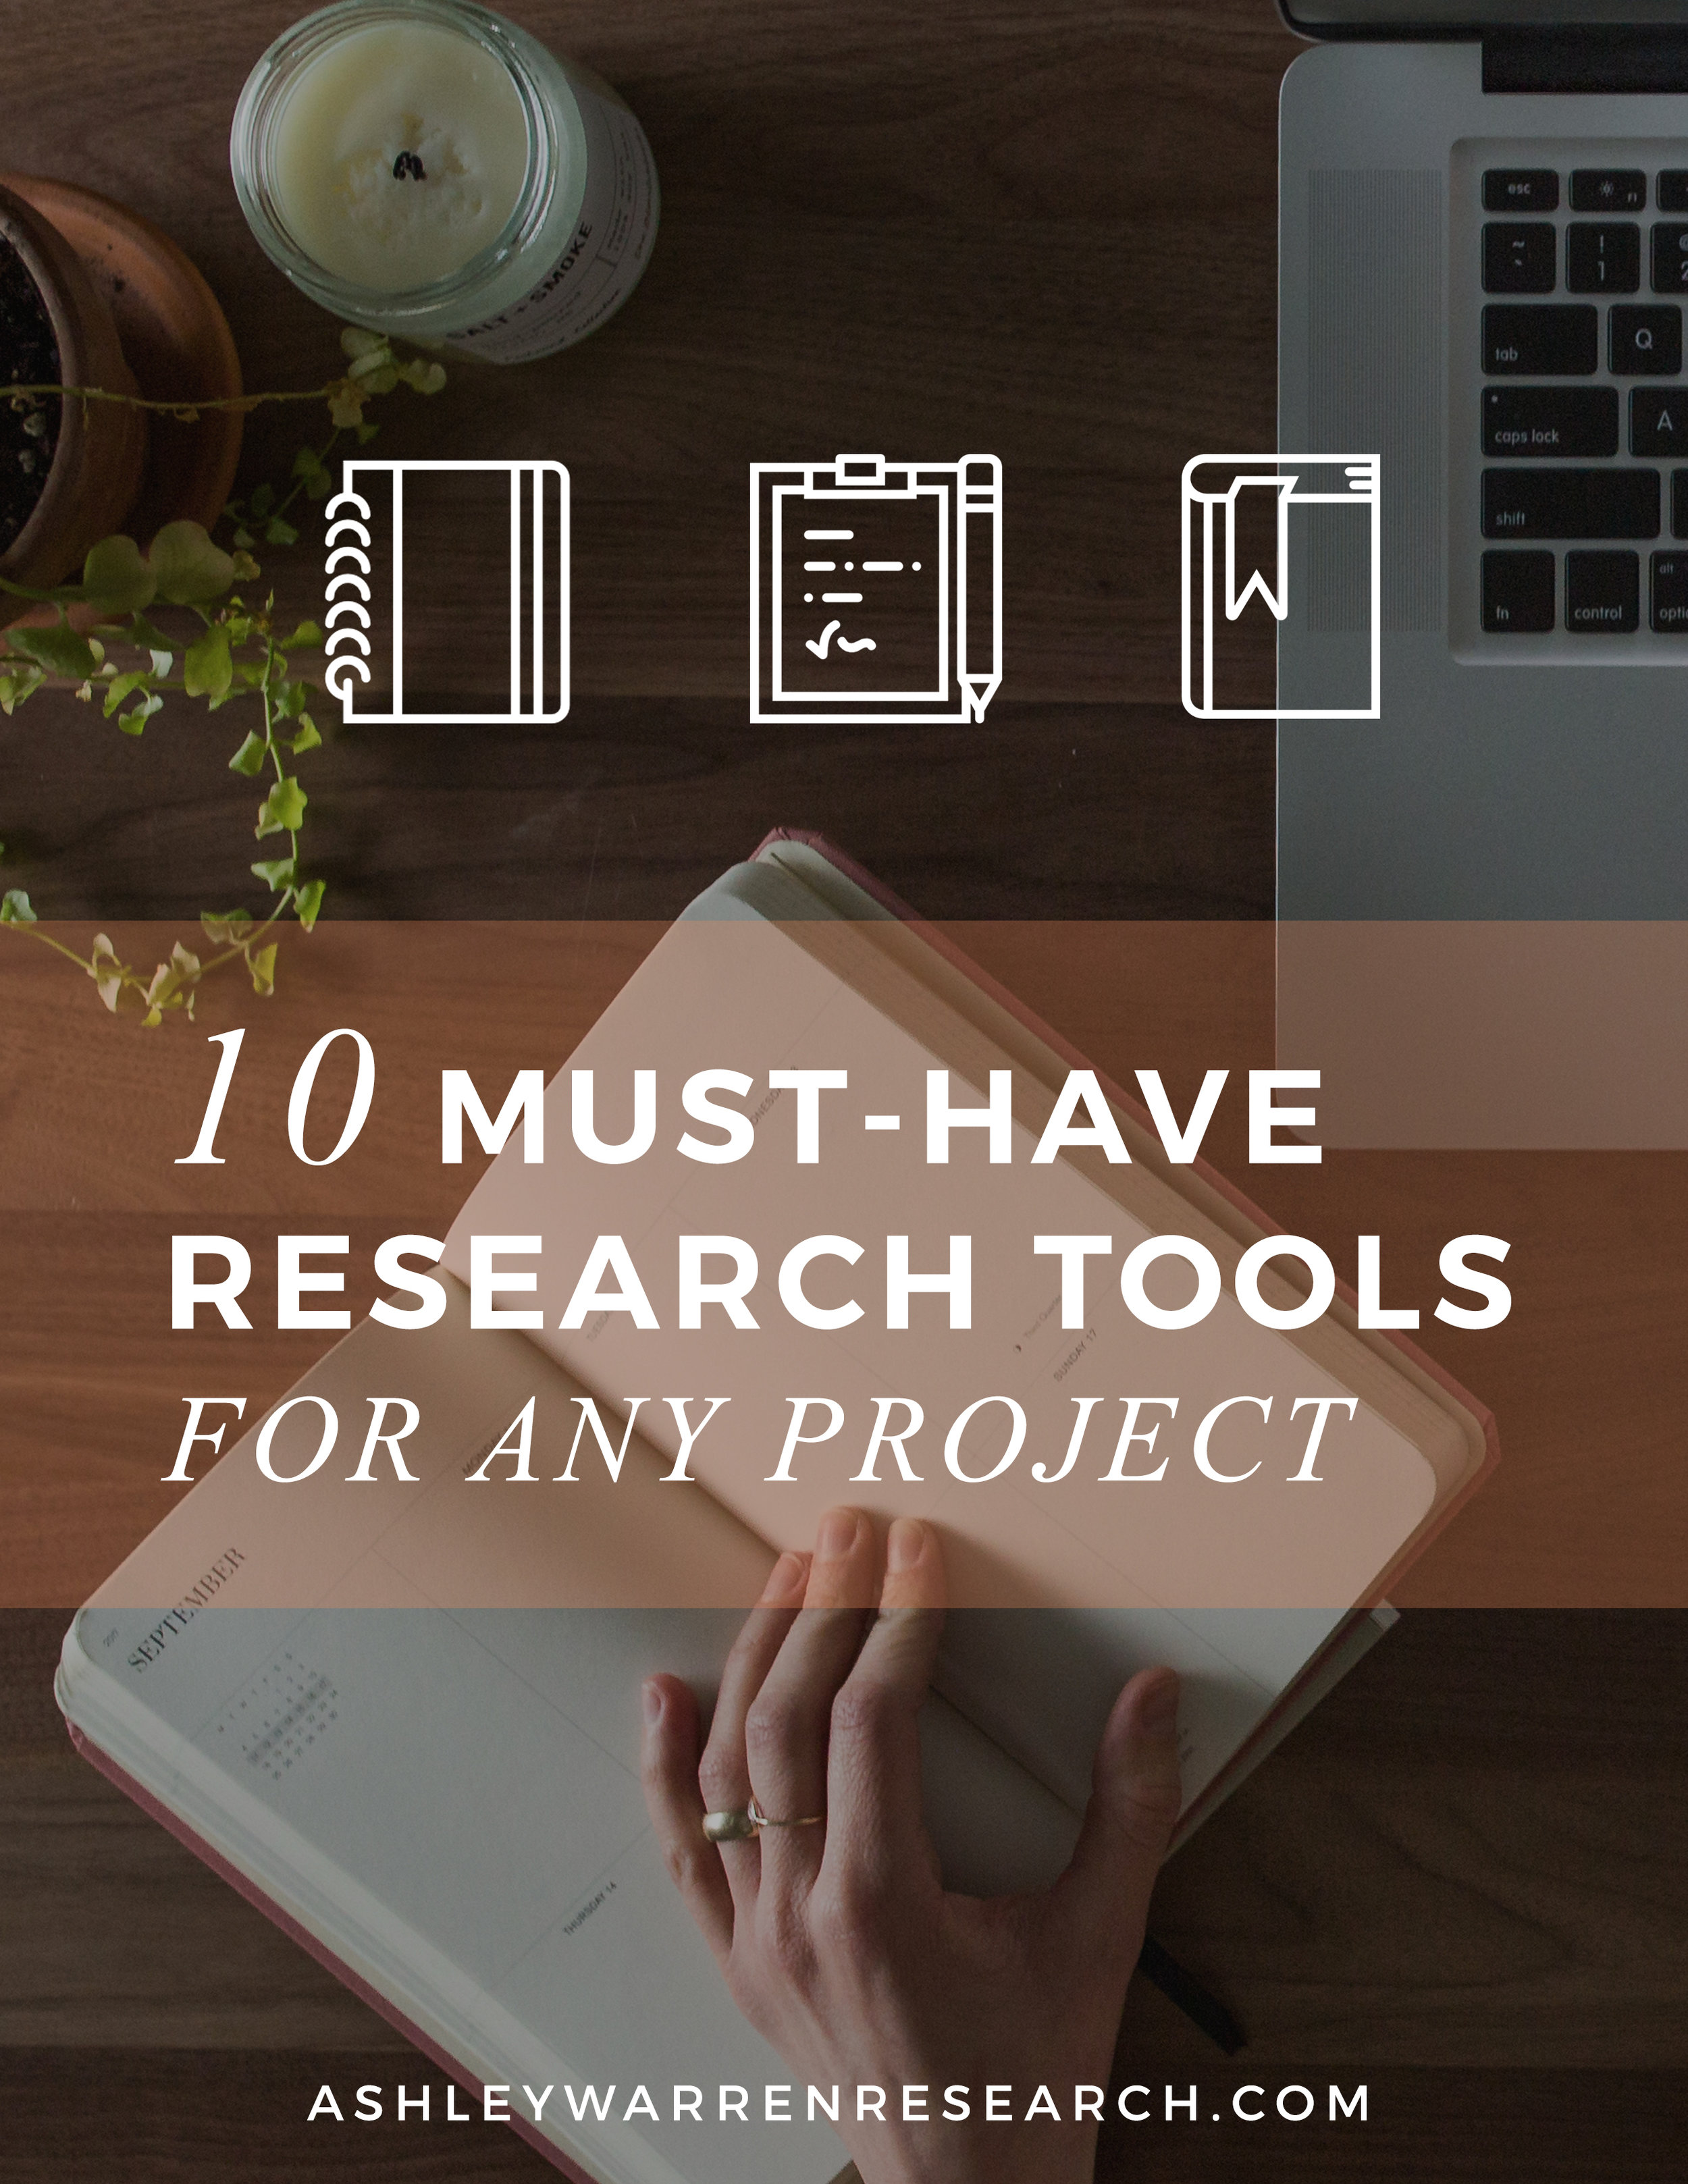 researchtools.jpg